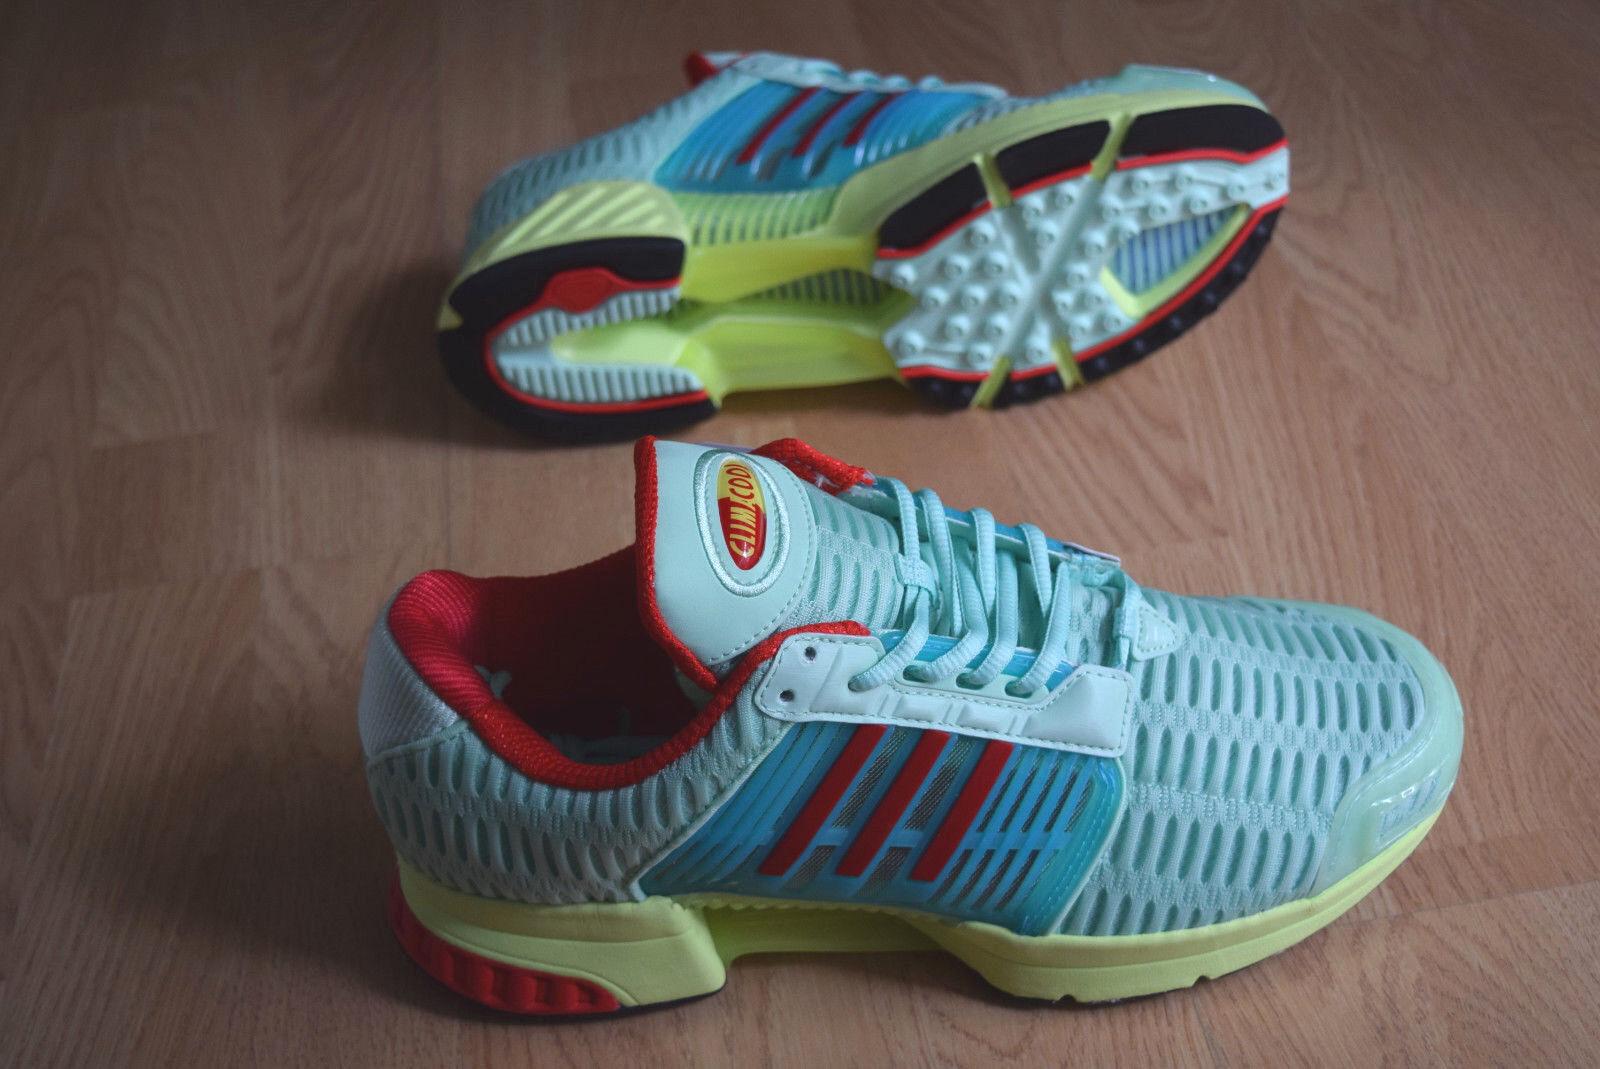 Adidas CC 1 Clima CooL 41 42 43 44 45 cc1 46,5 frozen cOnSorTium BA7158 cc1 45 support cf4a96